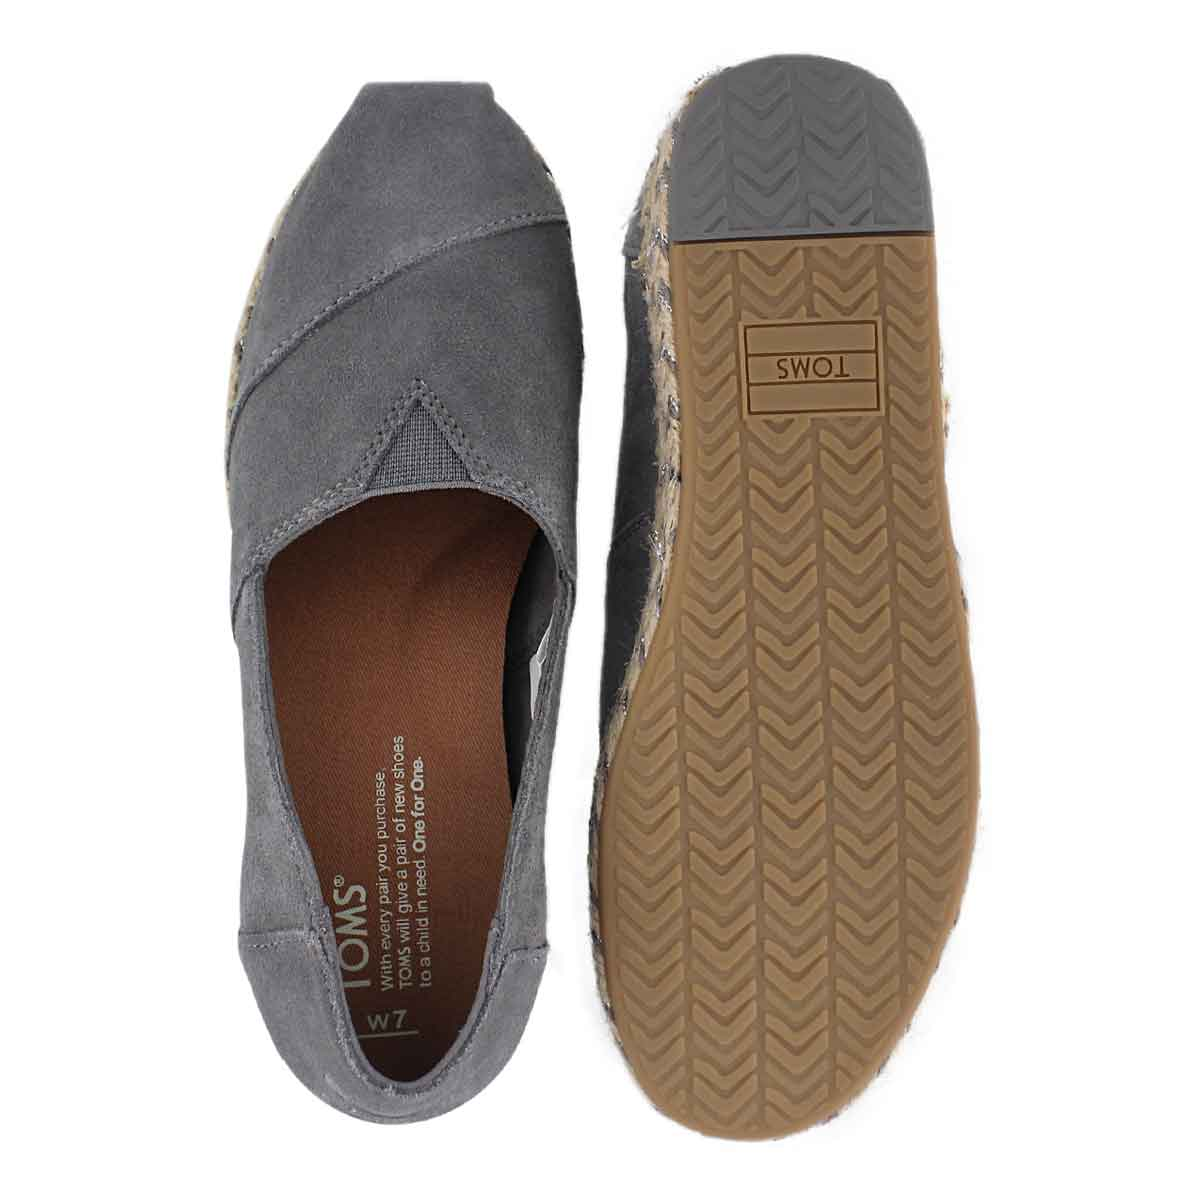 f6397c545ee TOMS Women s PLATFORM ALPARGATA shade loafers